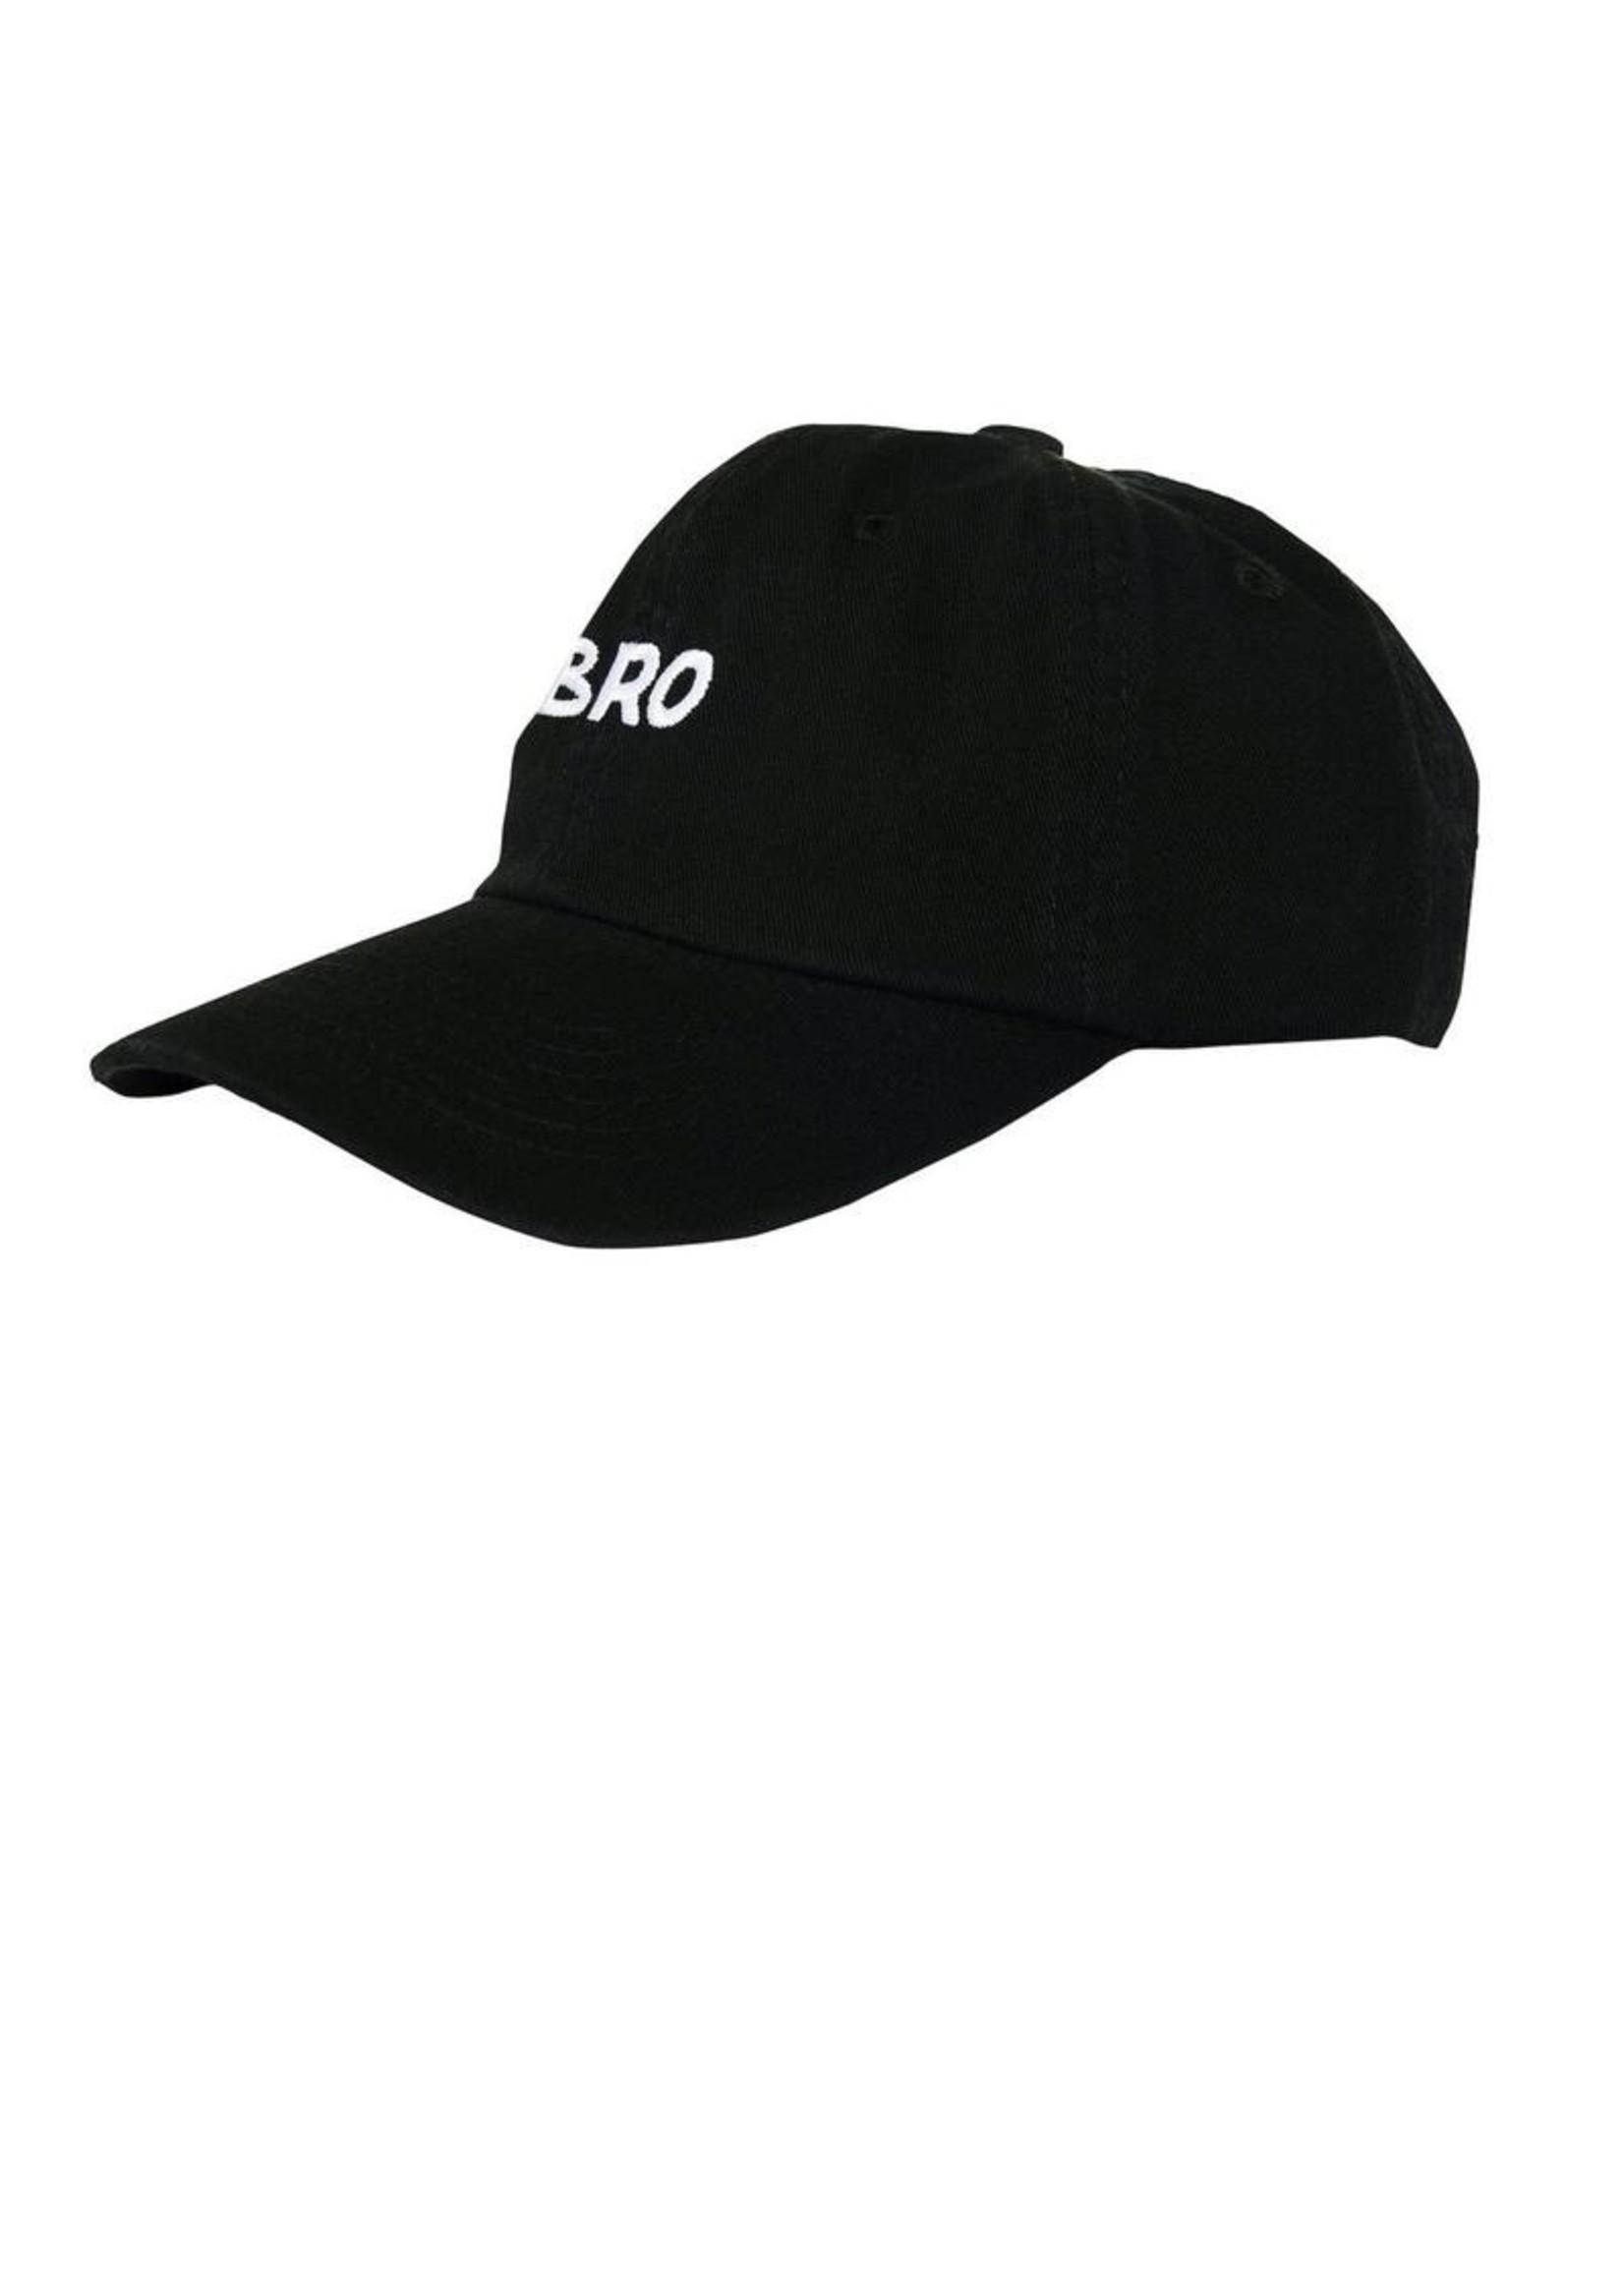 Headster Kids Headster Kids, Bro Adjustable Hat